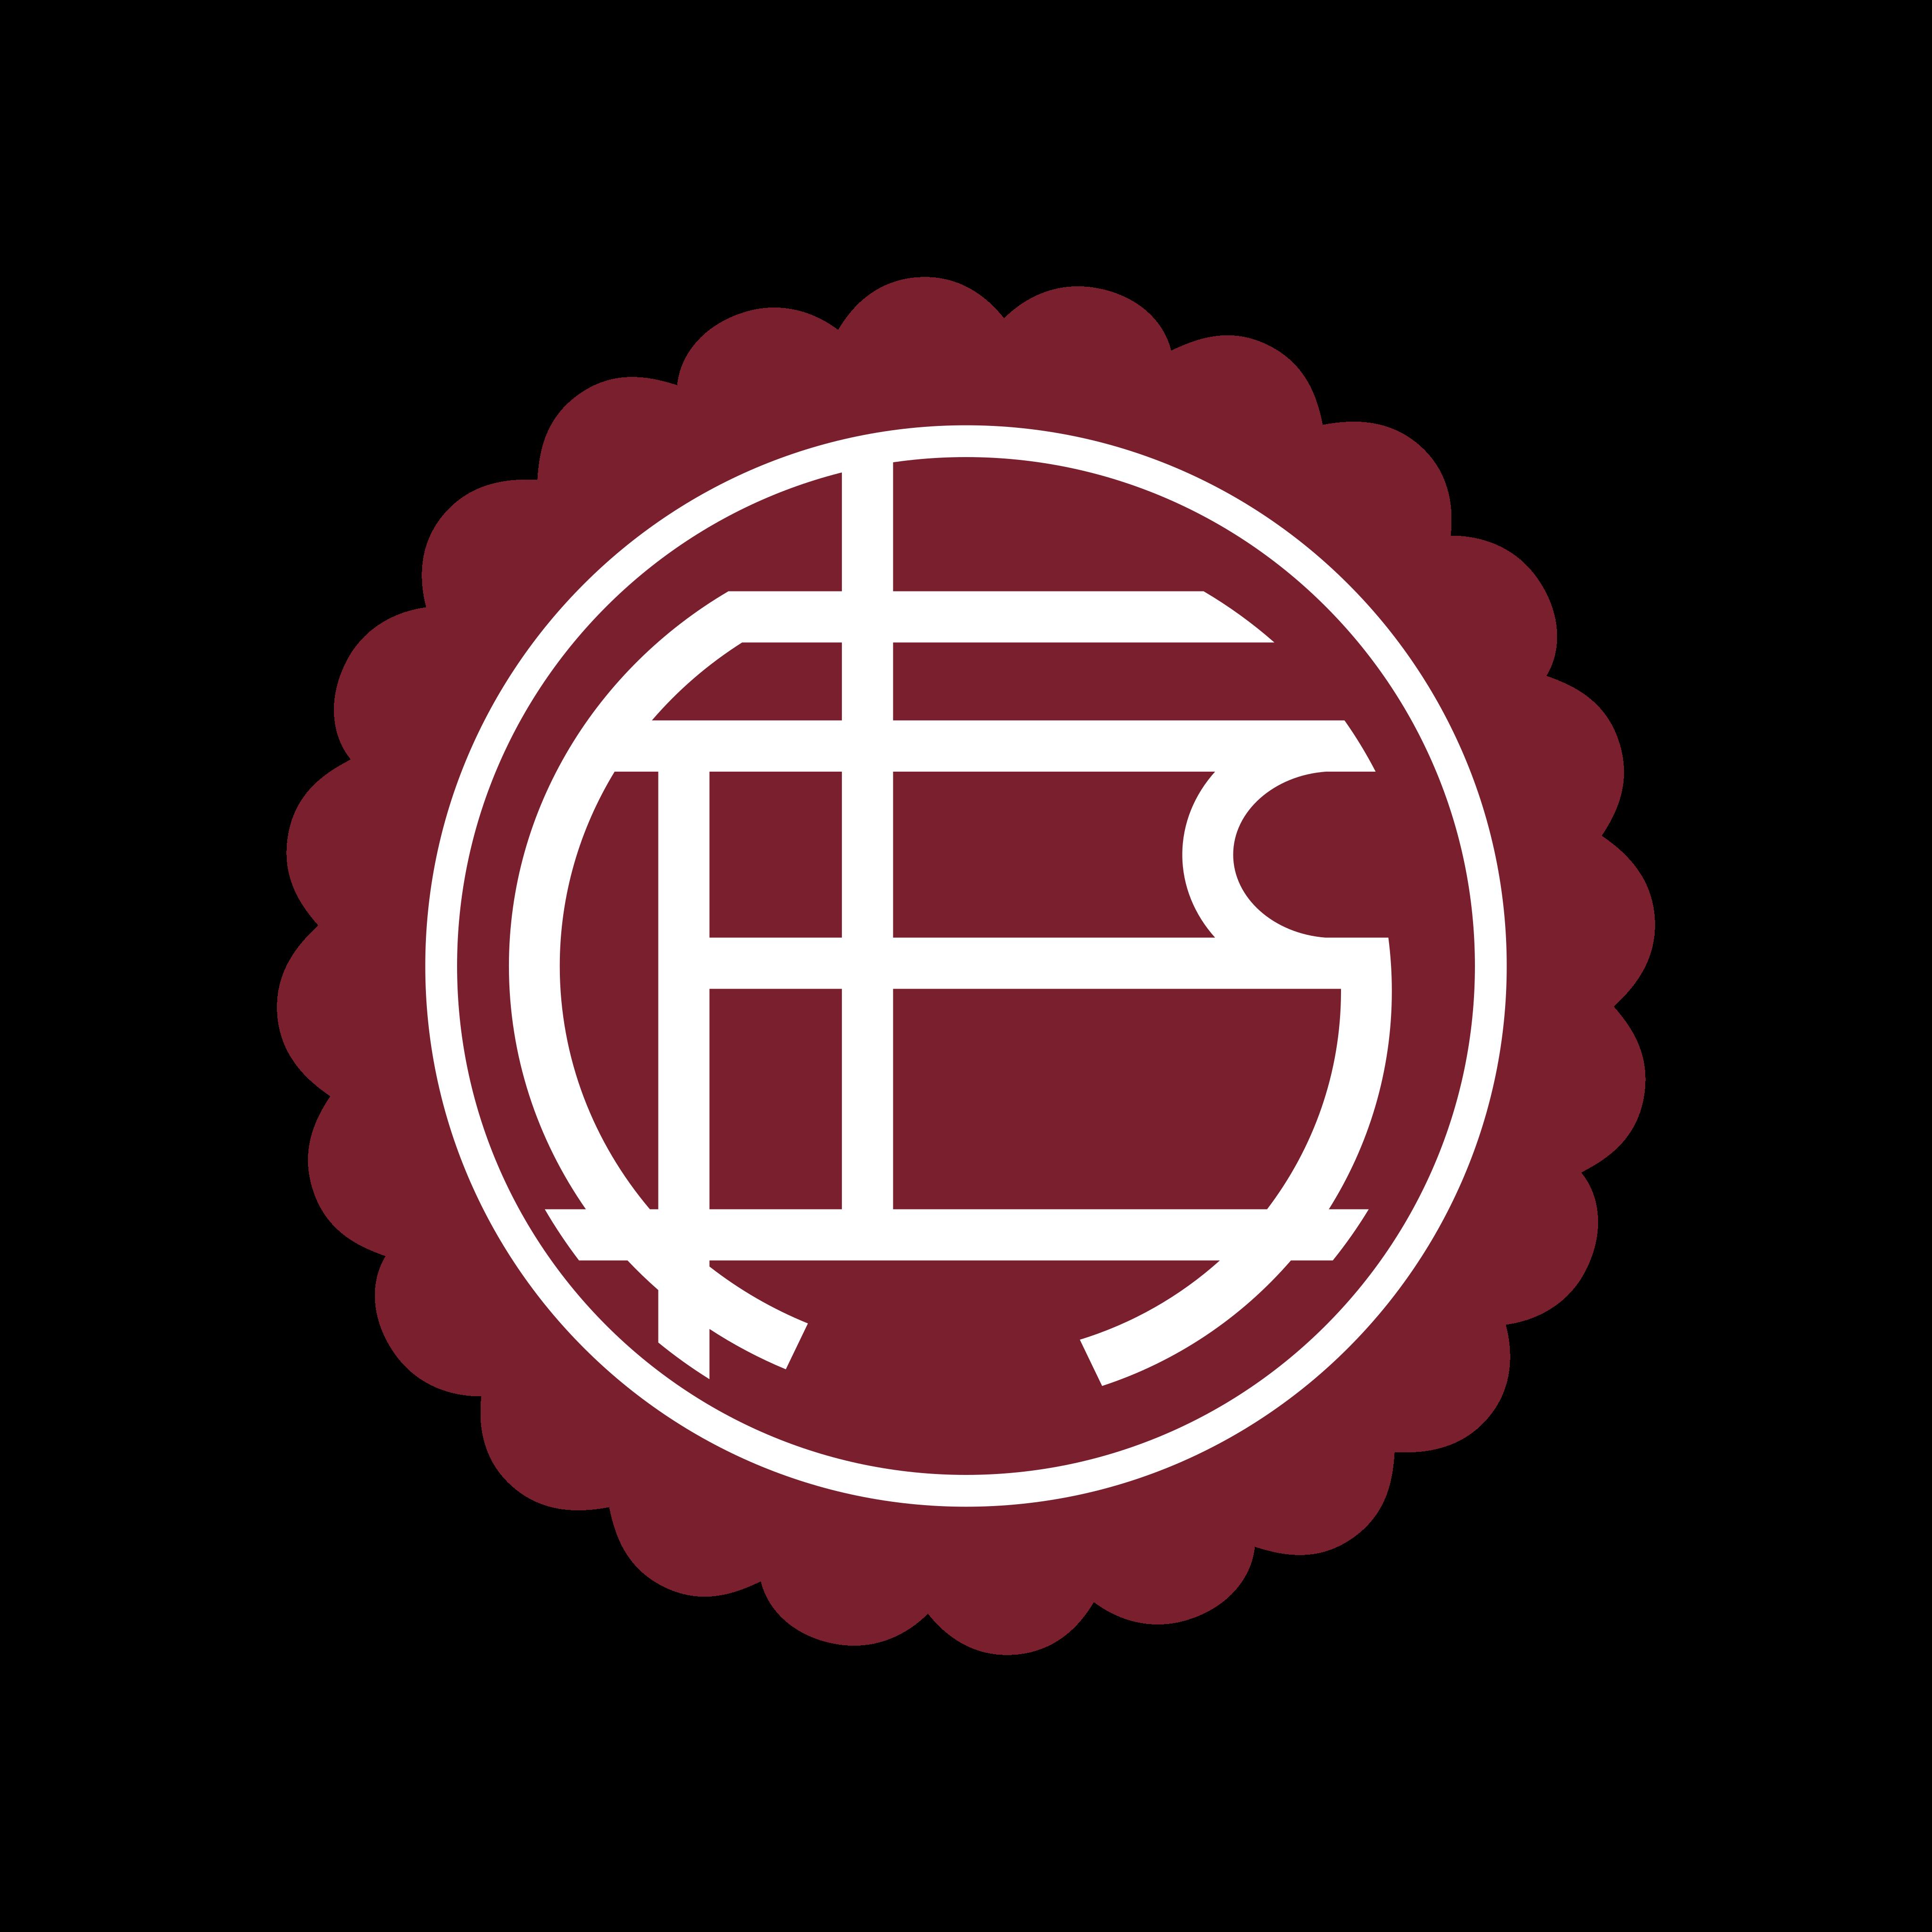 lanus logo 0 - Club Atlético Lanús Logo - Escudo